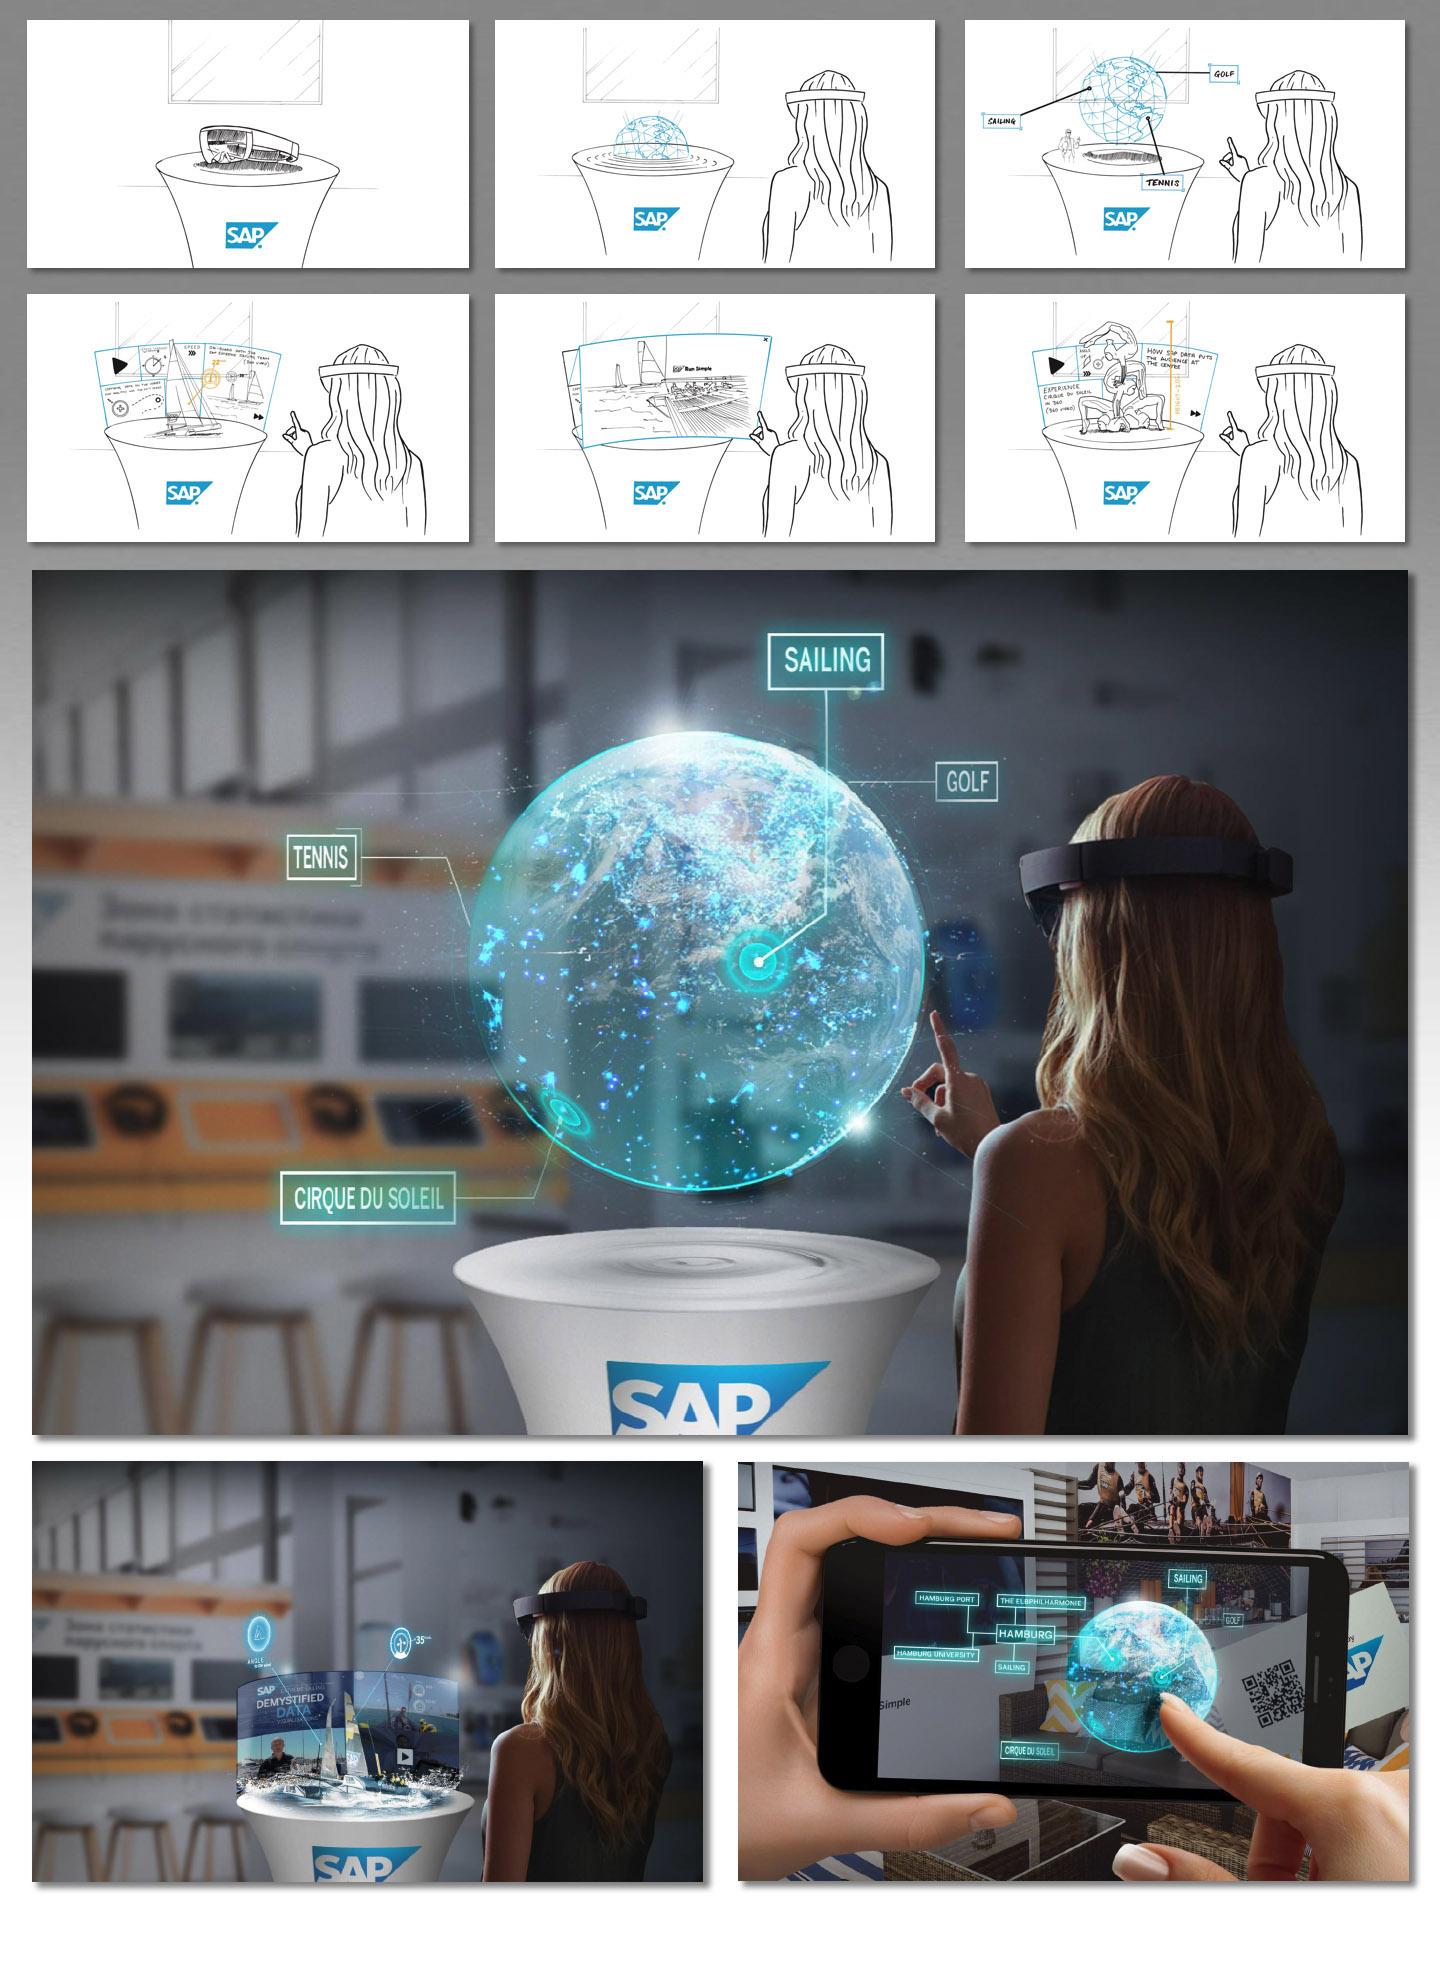 02 - SAP Exi Project